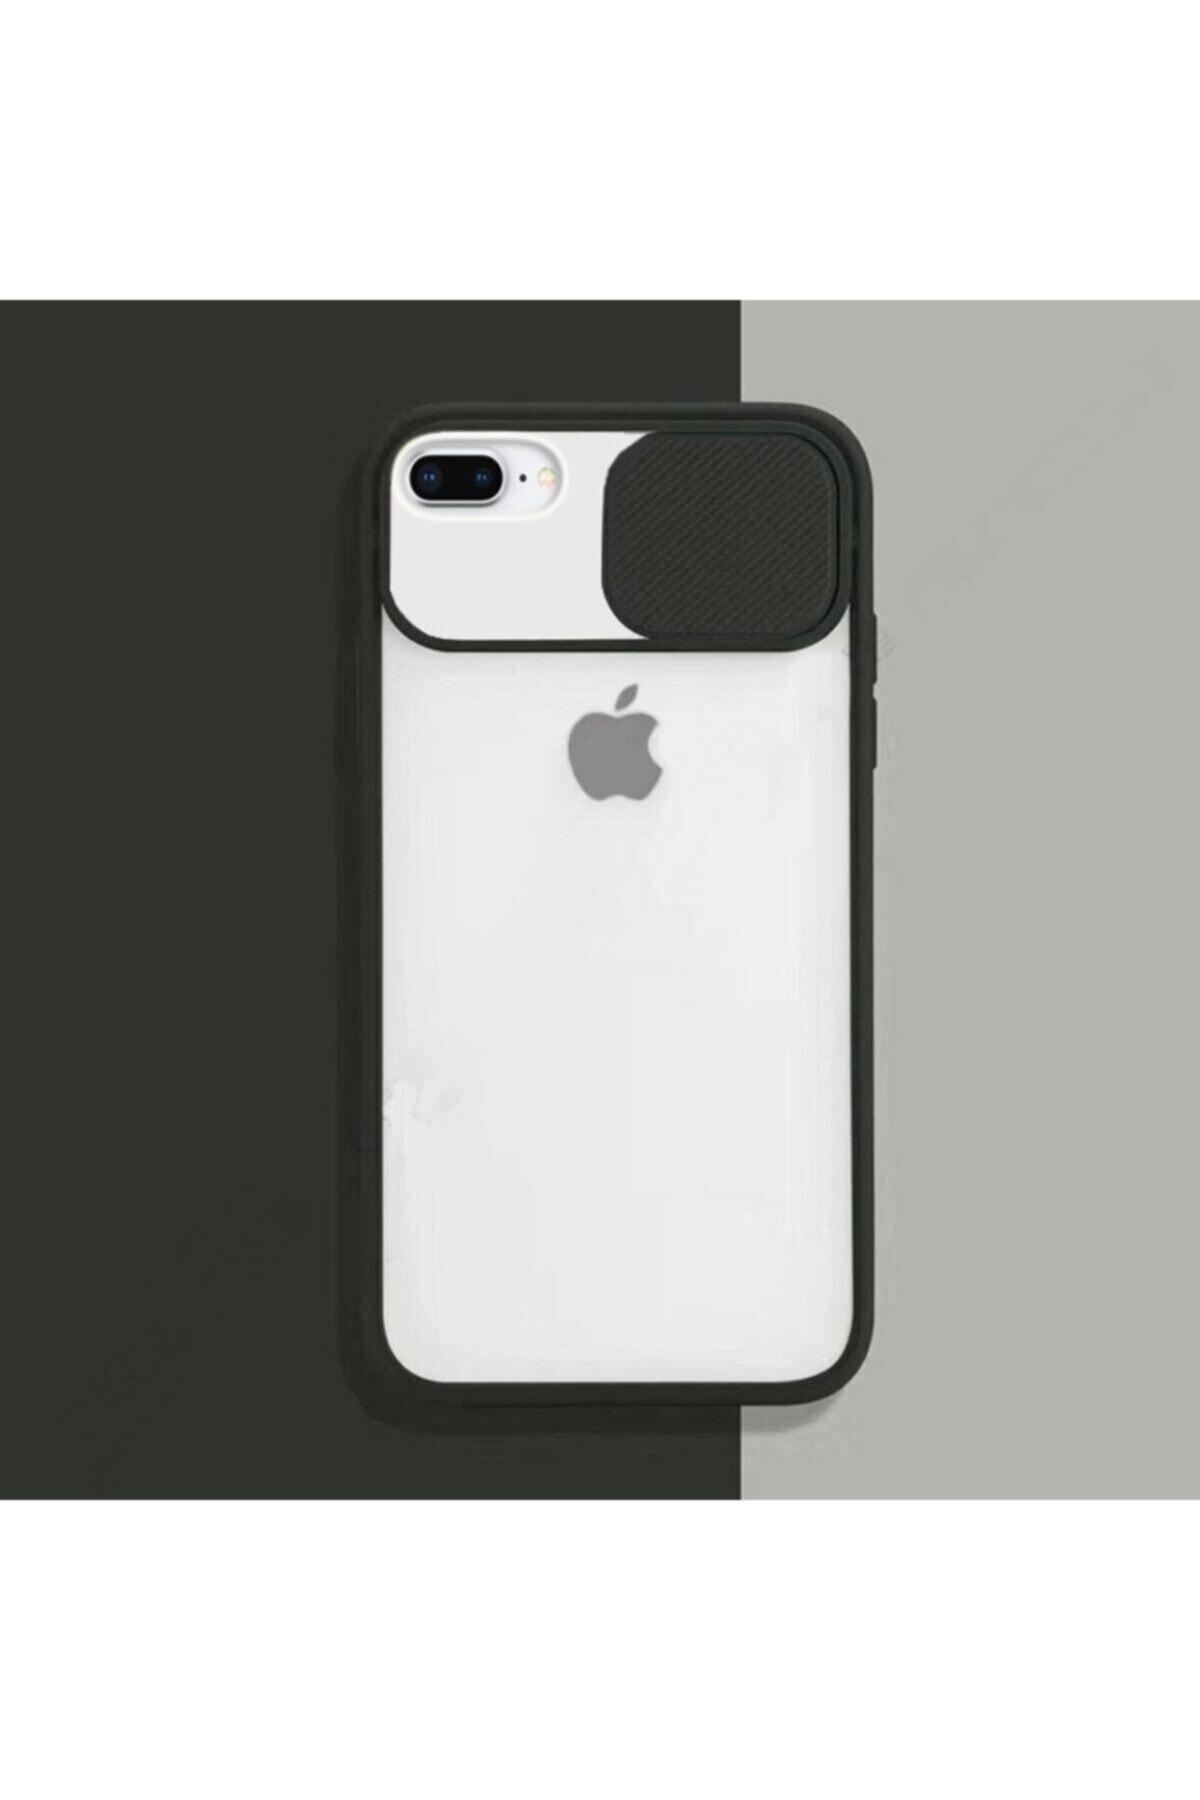 zore Siyah Iphone 7 Plus 8 Plus Sürgülü Kamera Korumalı Silikon Kılıf 1